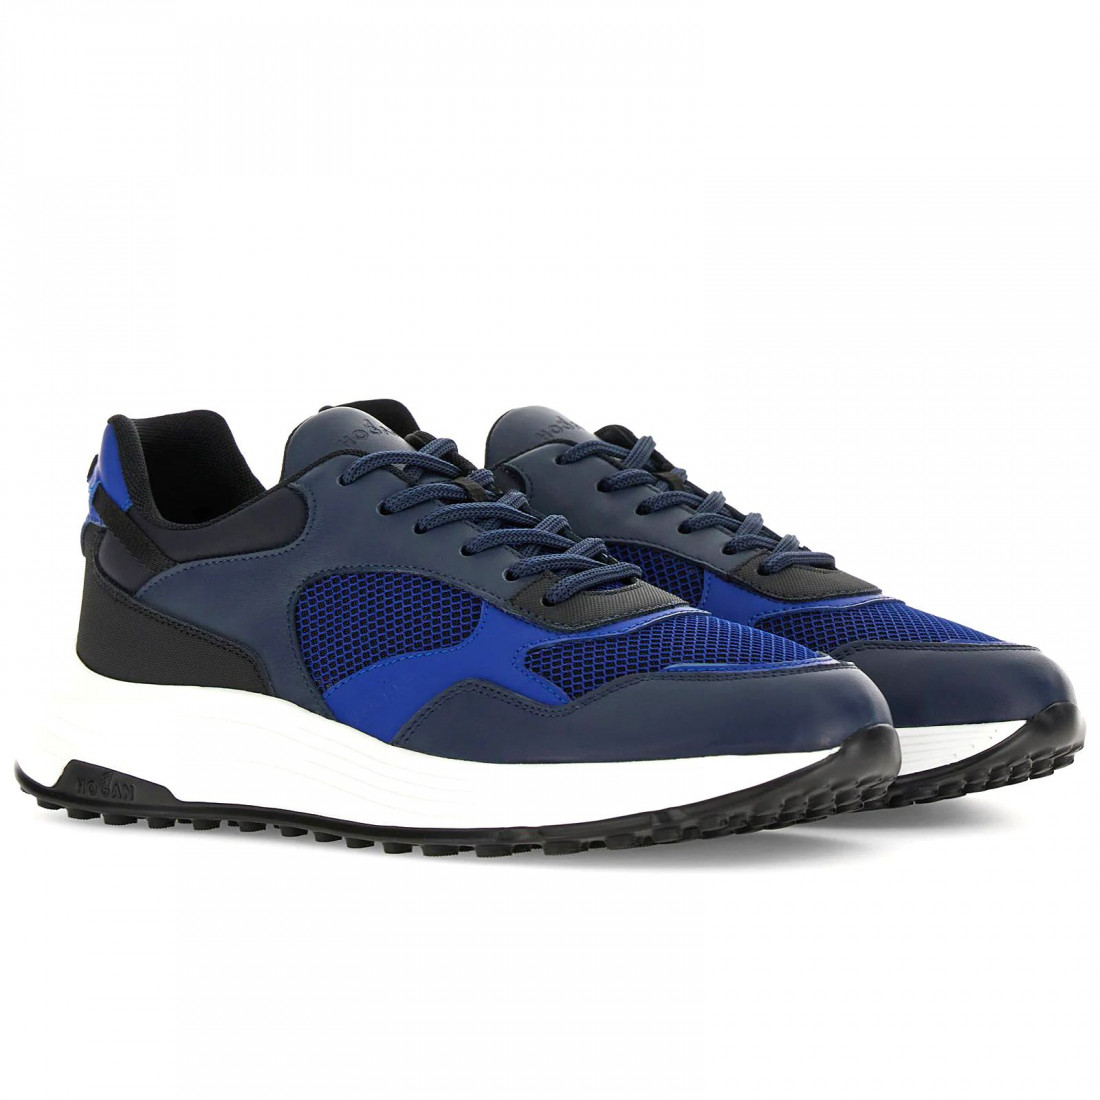 sneakers uomo hogan hxm5630dm90qdd629d 8863